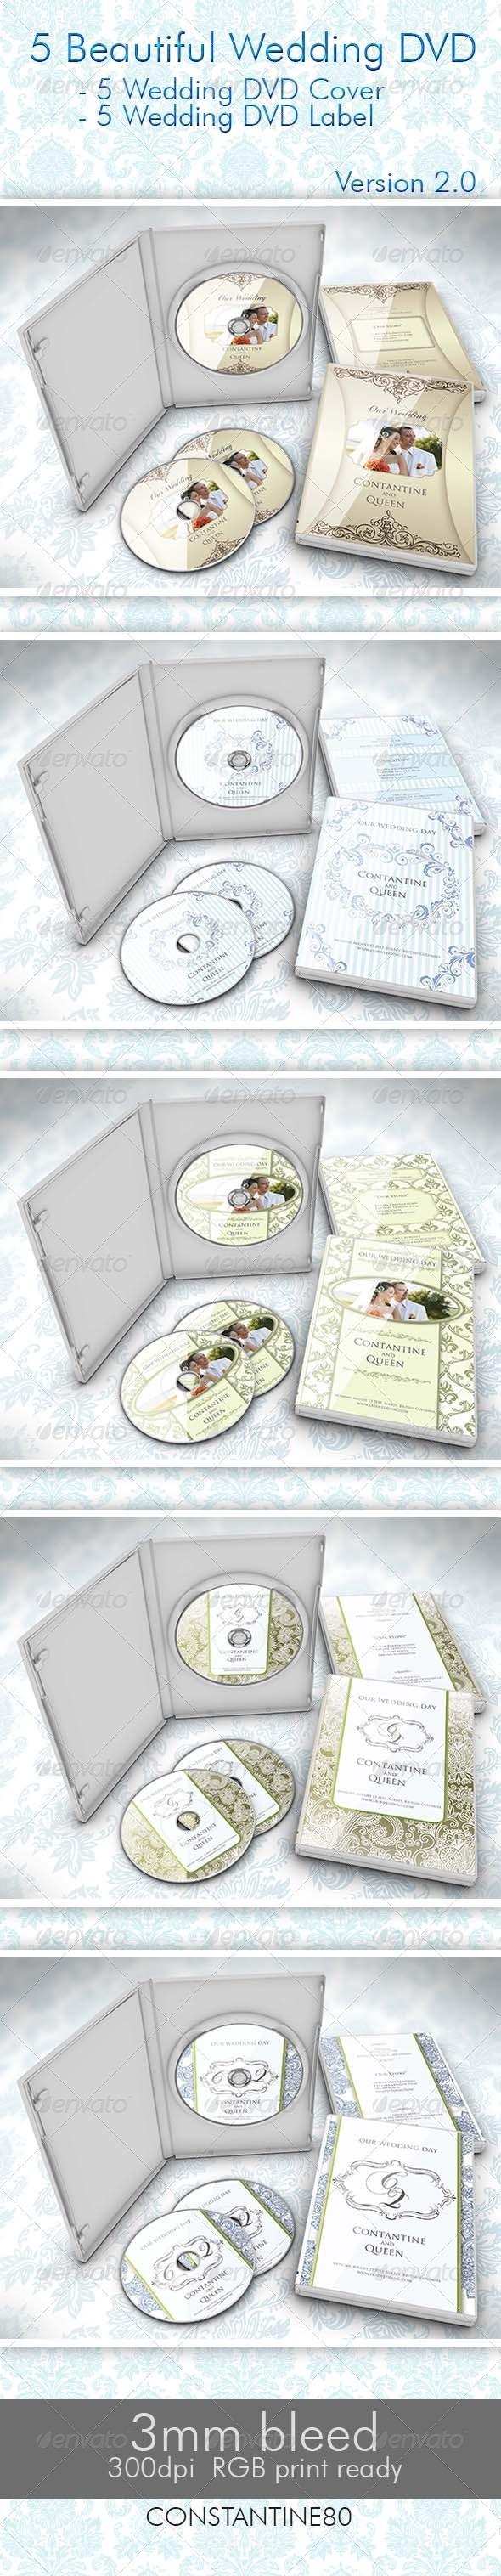 5 Beautiful Wedding DVD Ver 2.0 - Weddings Cards & Invites